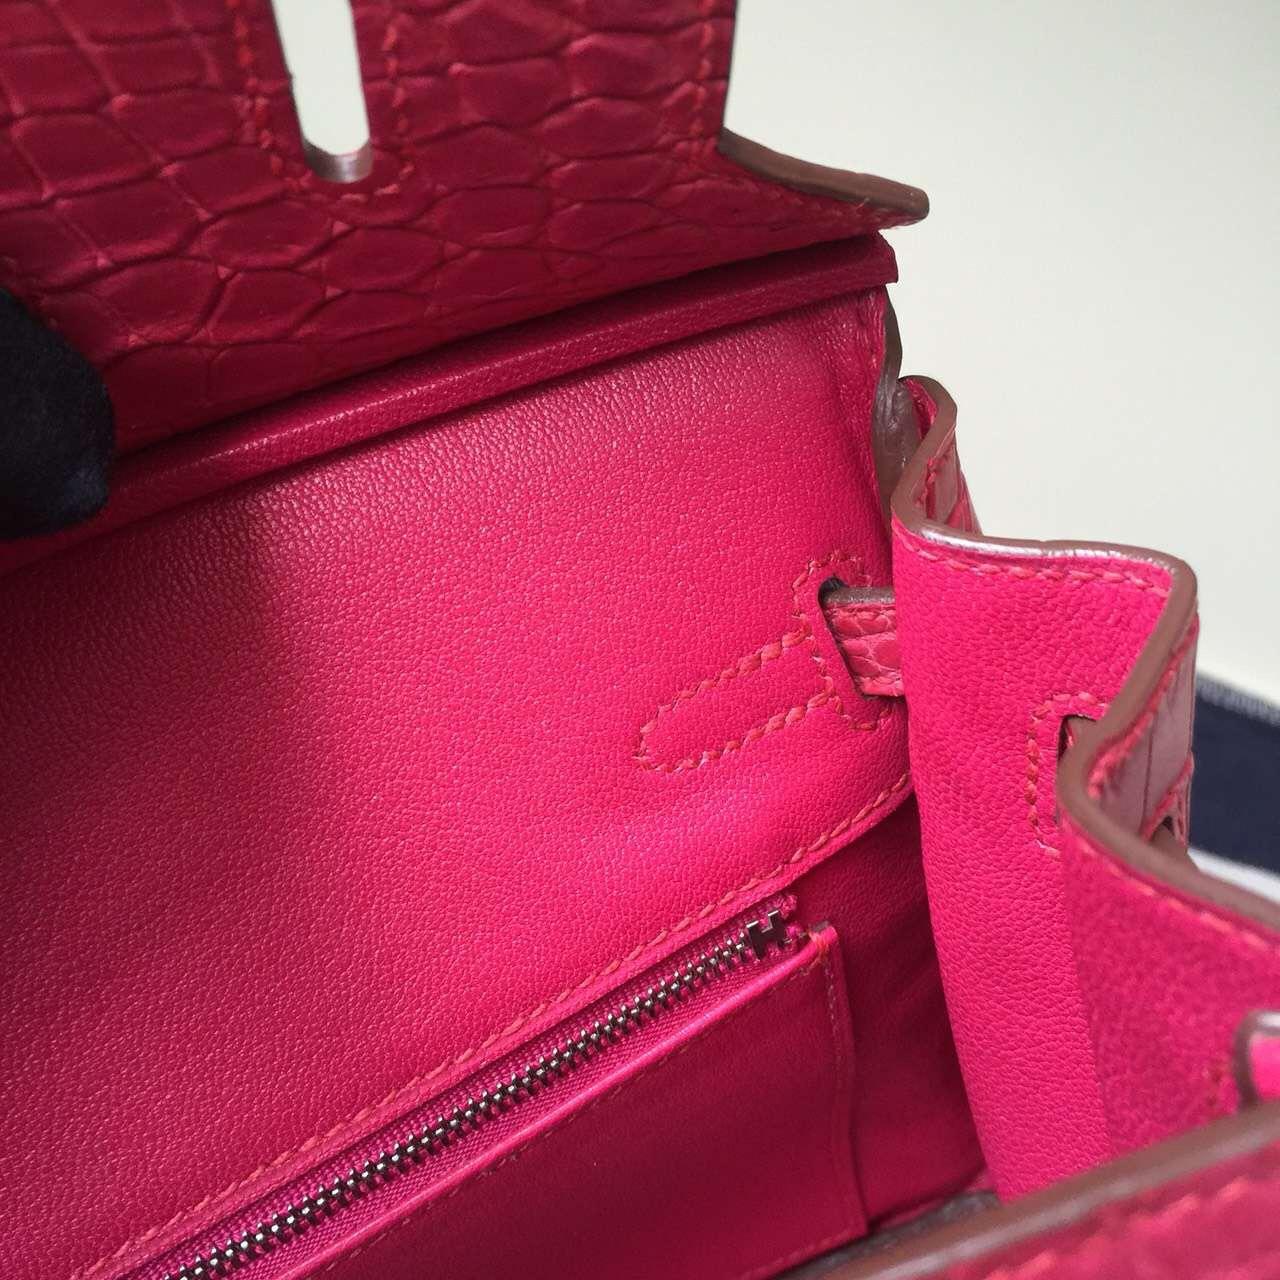 Discount Hermes Crocodile Matt Leather Birkin Bag25cm in 5R Rose Tyrien